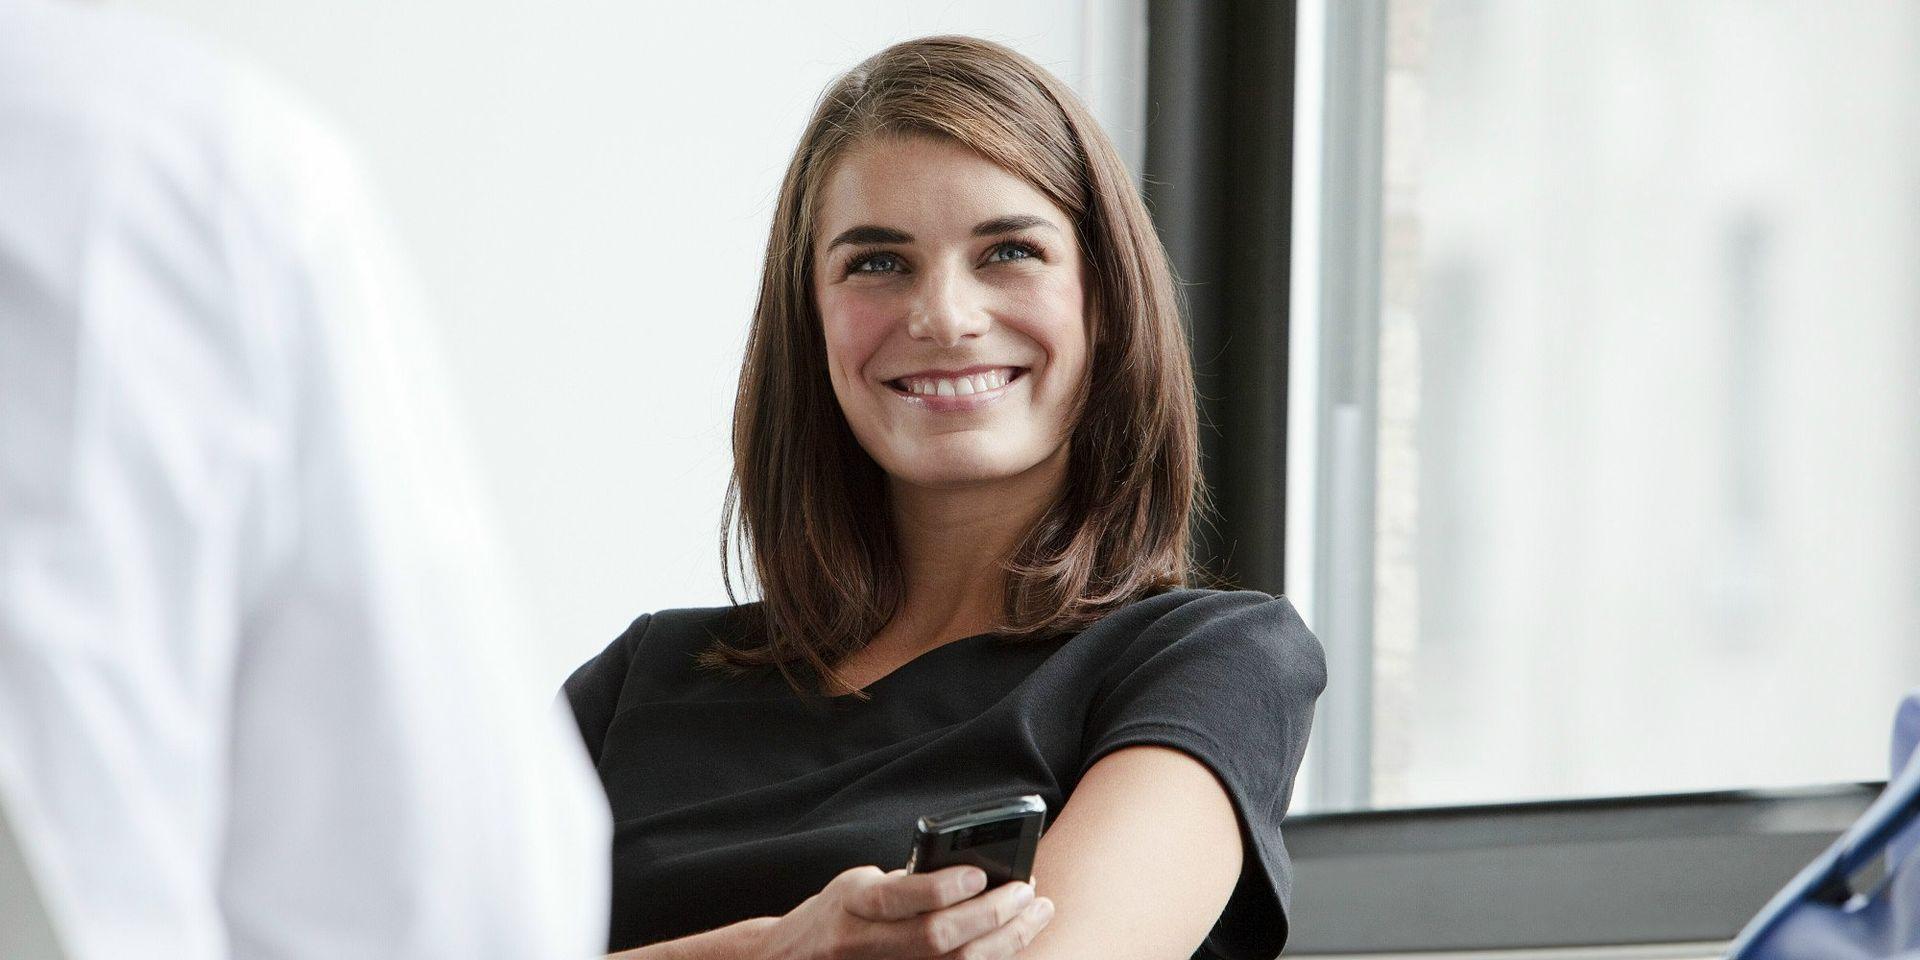 o-women-in-business-facebook-business-woman (4)